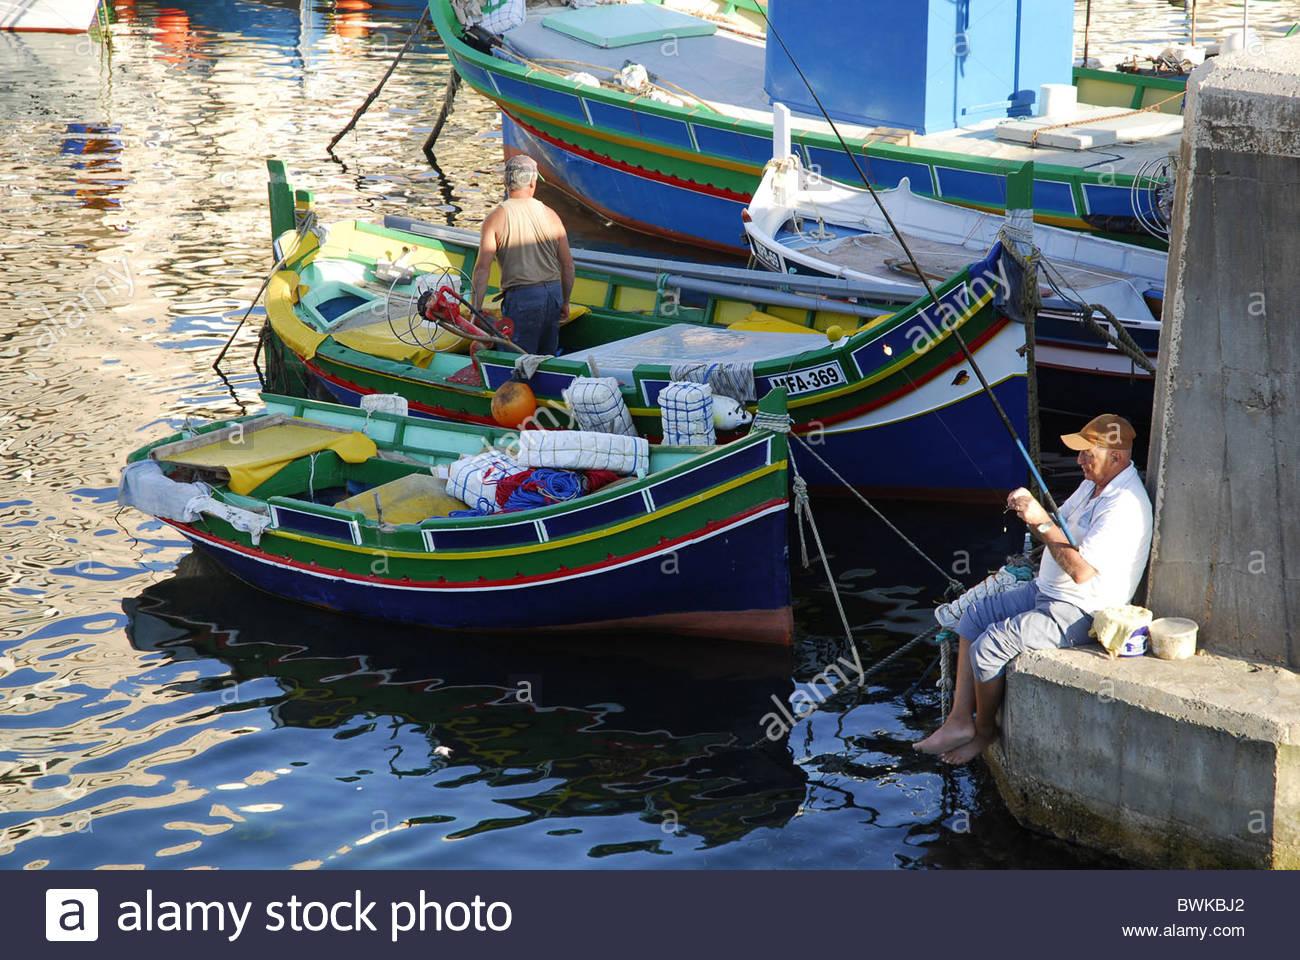 Fishing boats in the harbour, Marsalforn Bay, Marsalforn, Gozo Island, Malta, Mediterranean, Europe Stock Photo